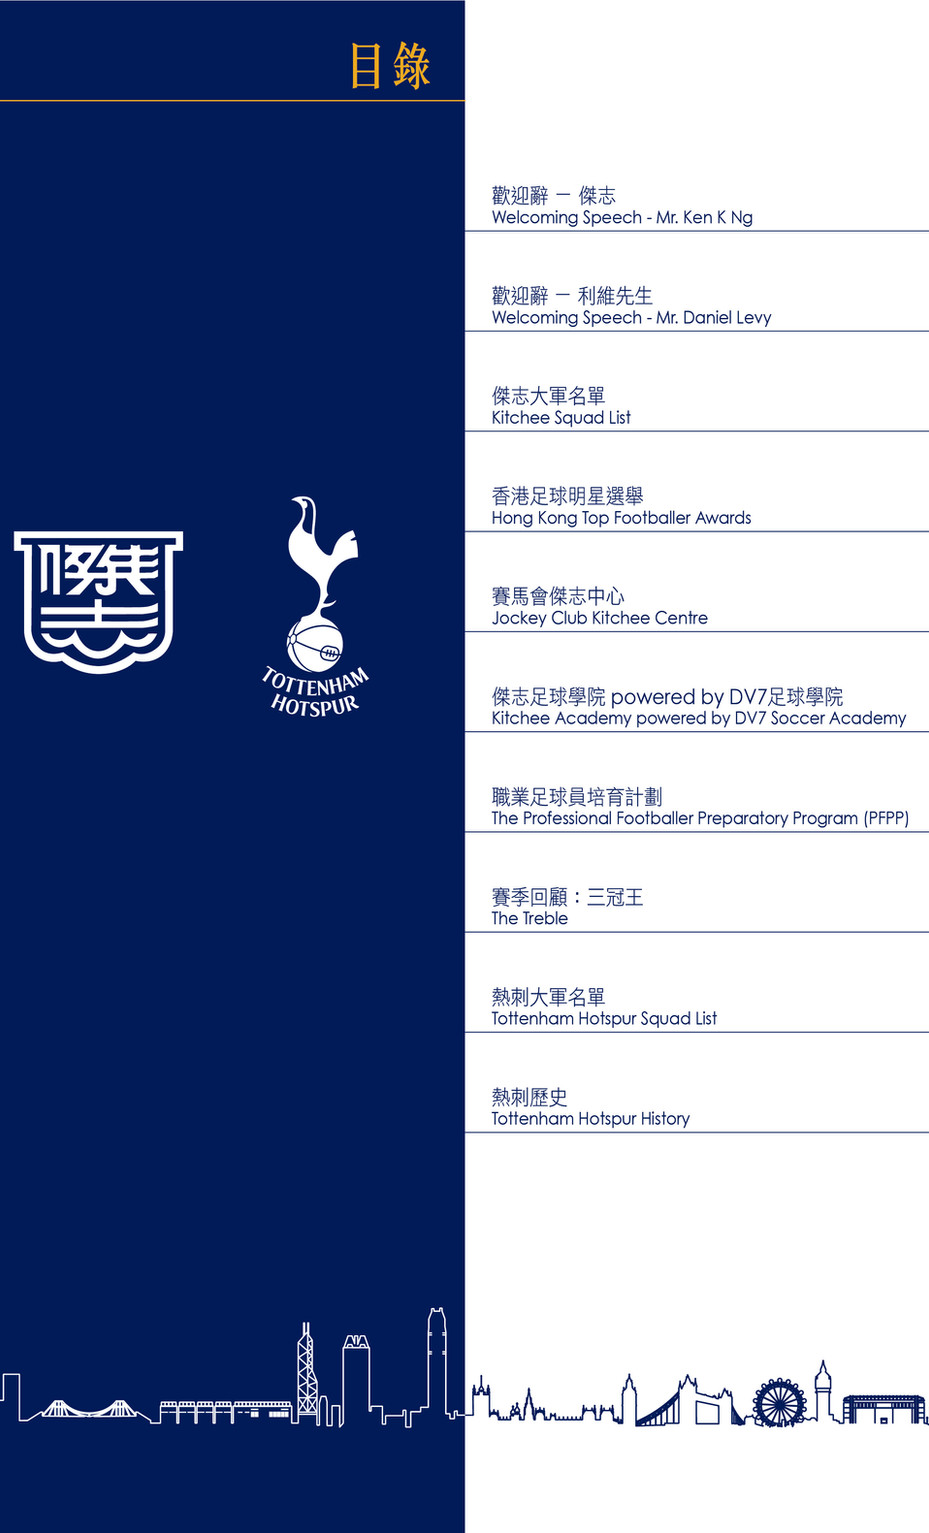 TH_Matchday-01.jpg